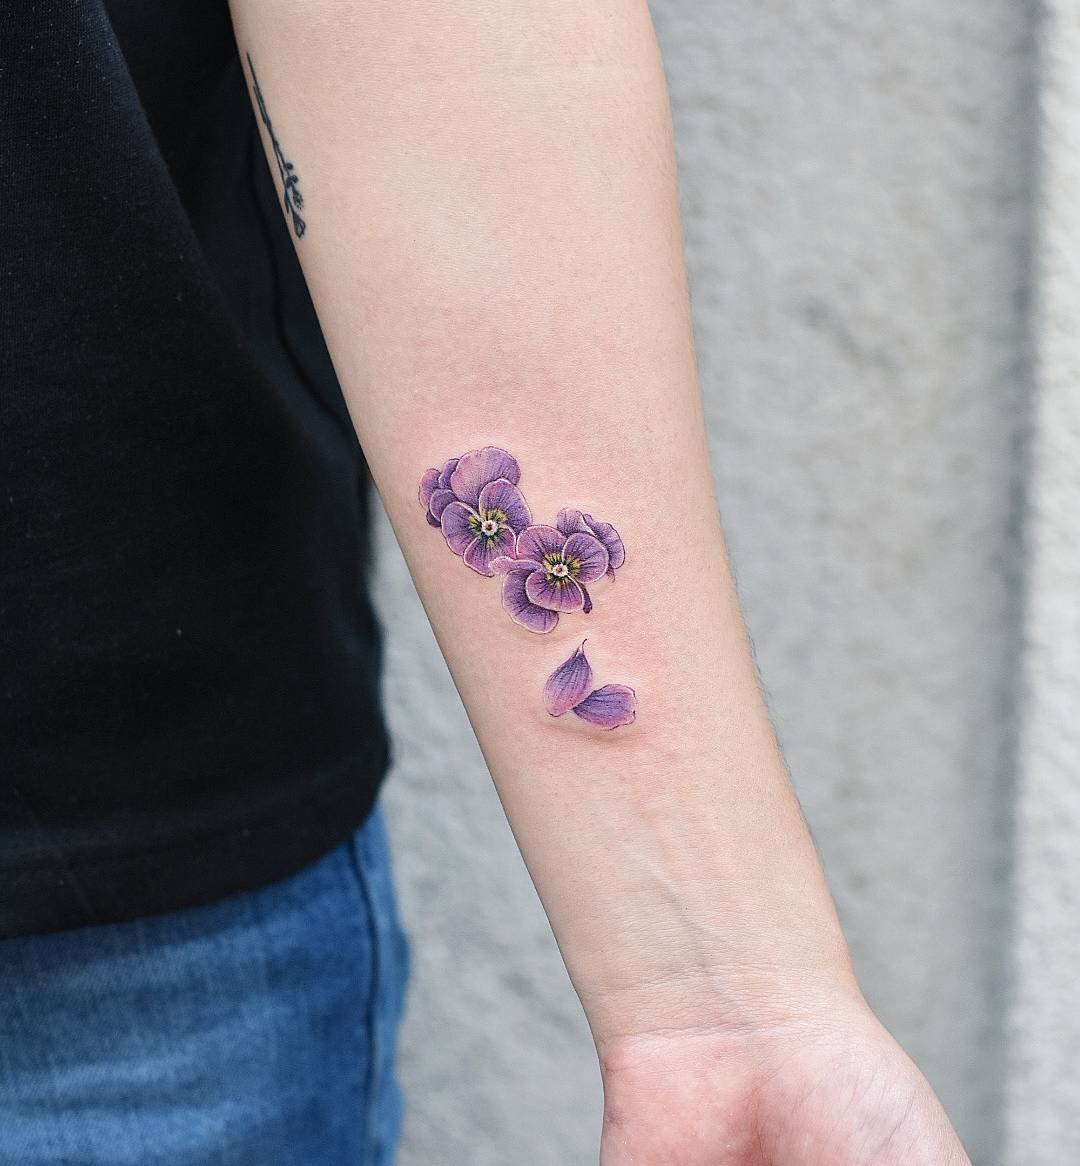 Tiny purple flowers tattoo on the wrist